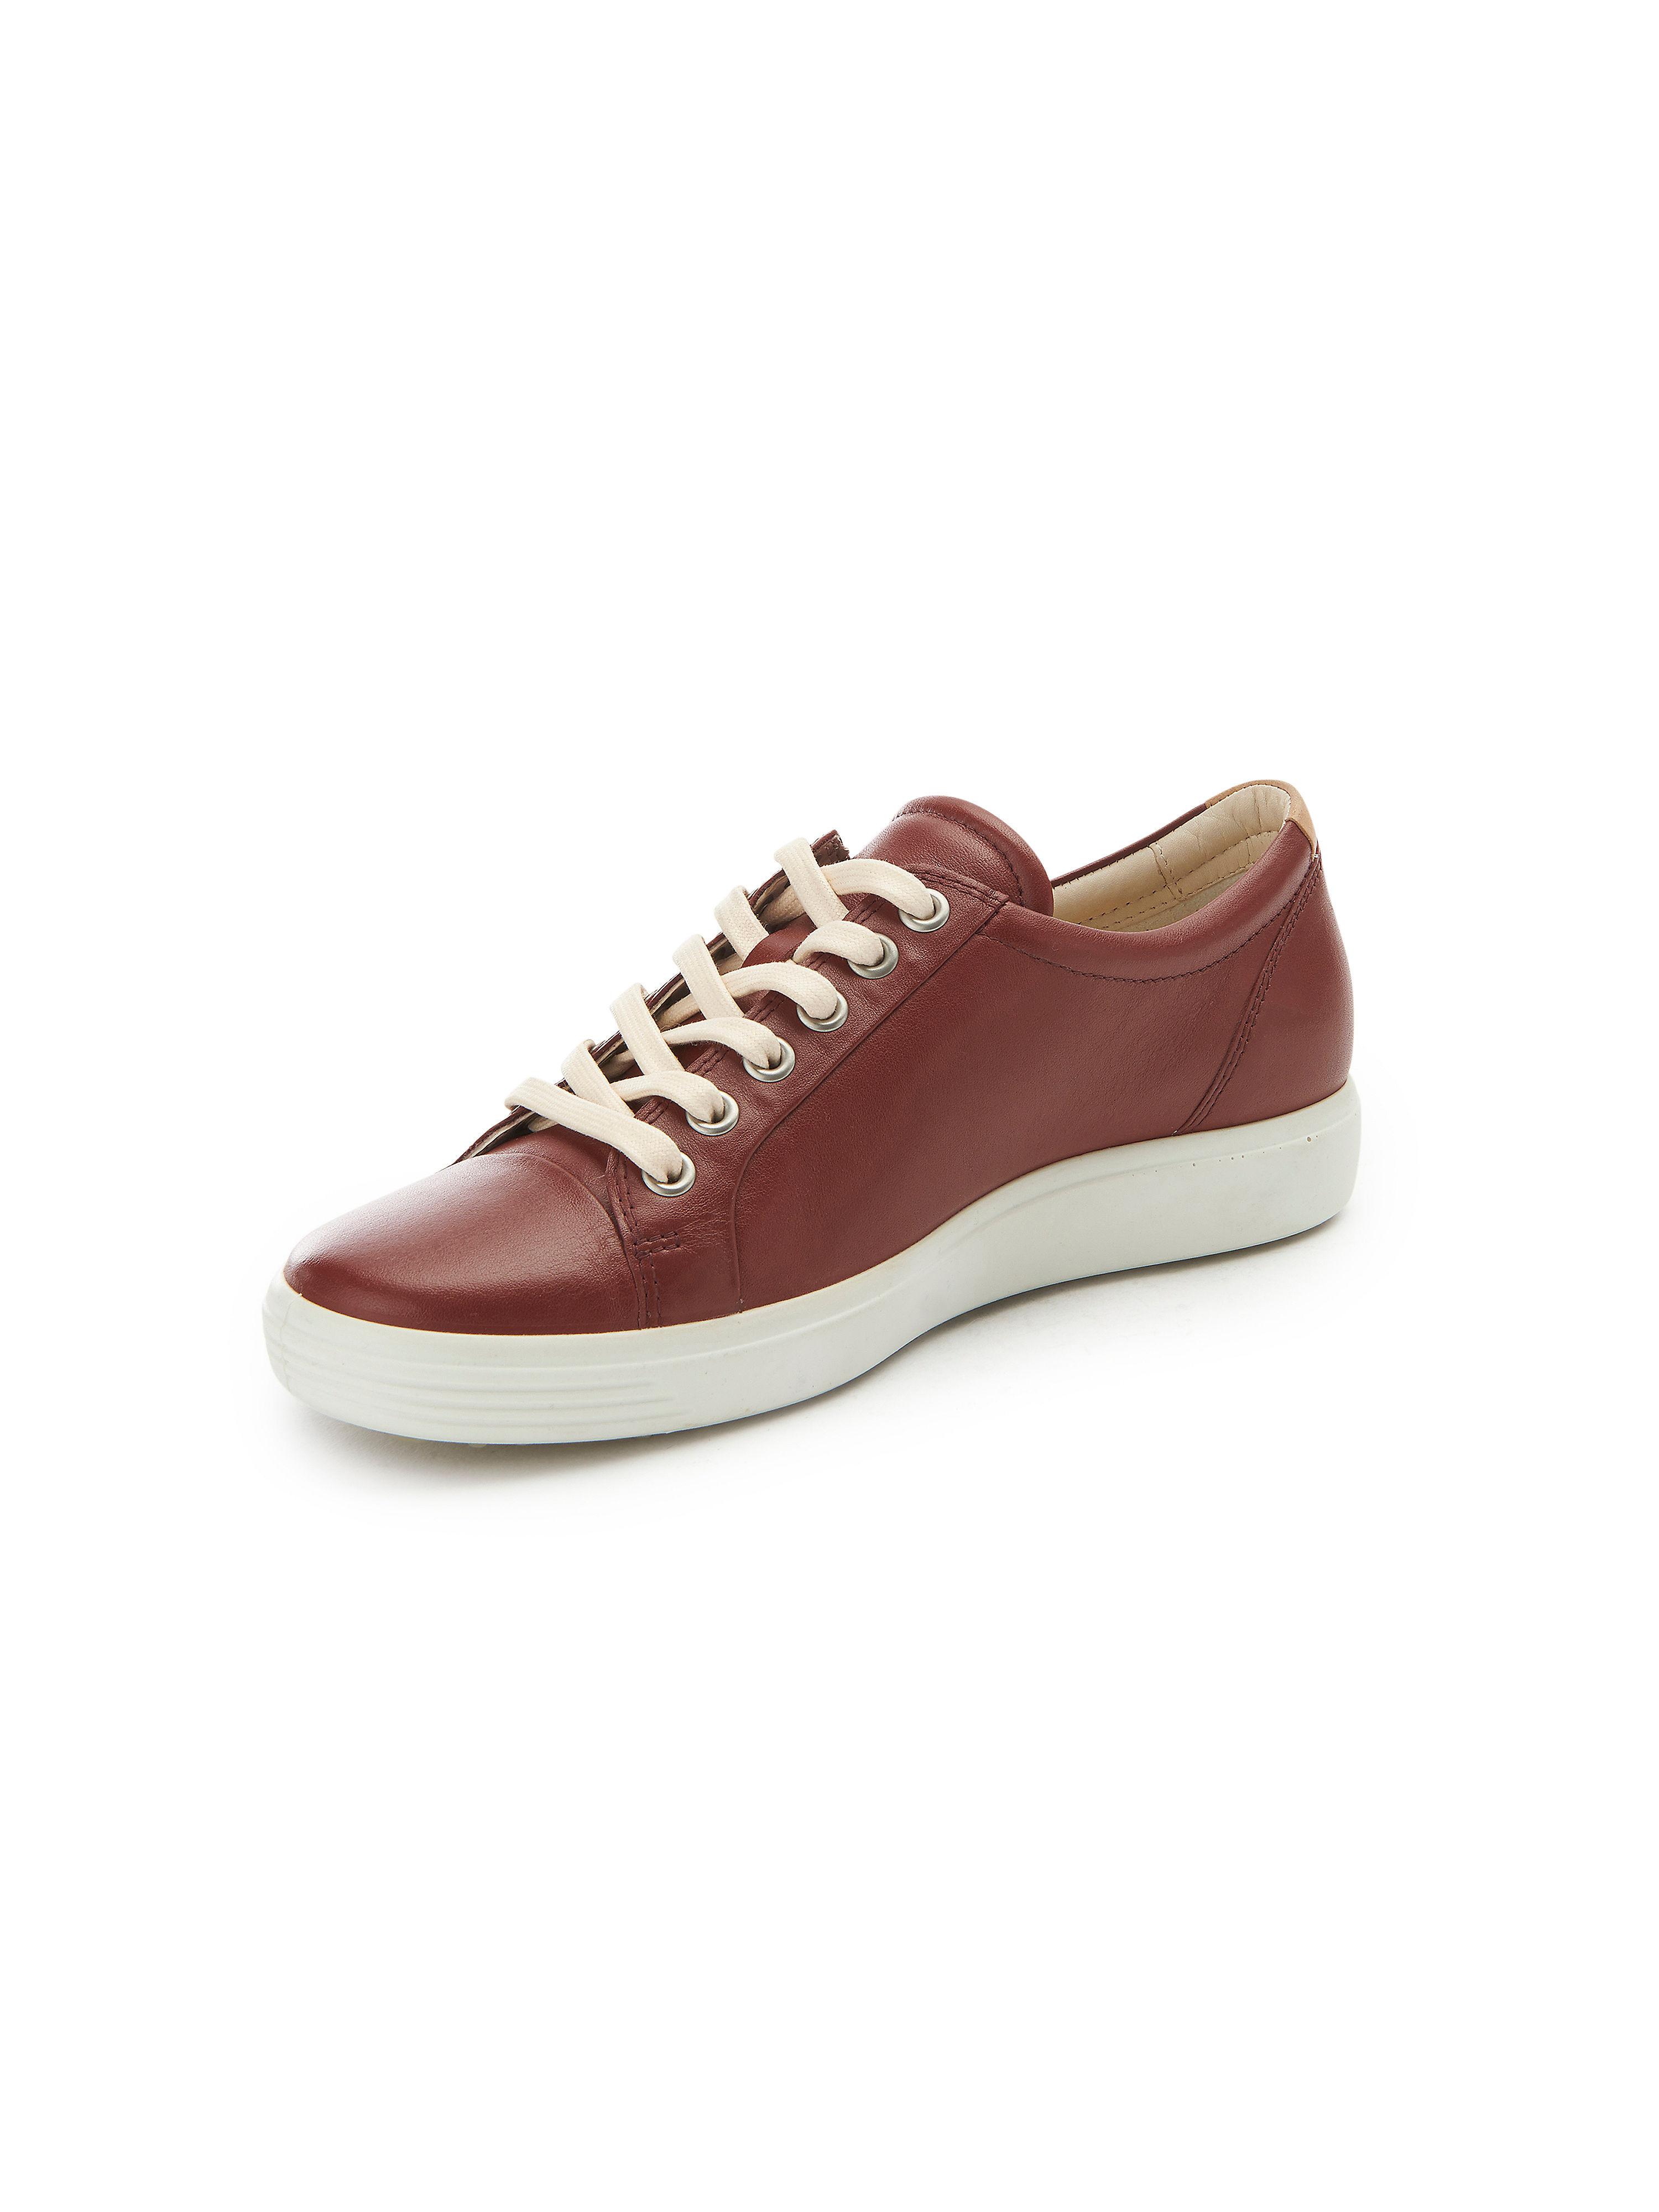 Image of   Sneakers 'Soft 7 Ladies' Fra Ecco orange